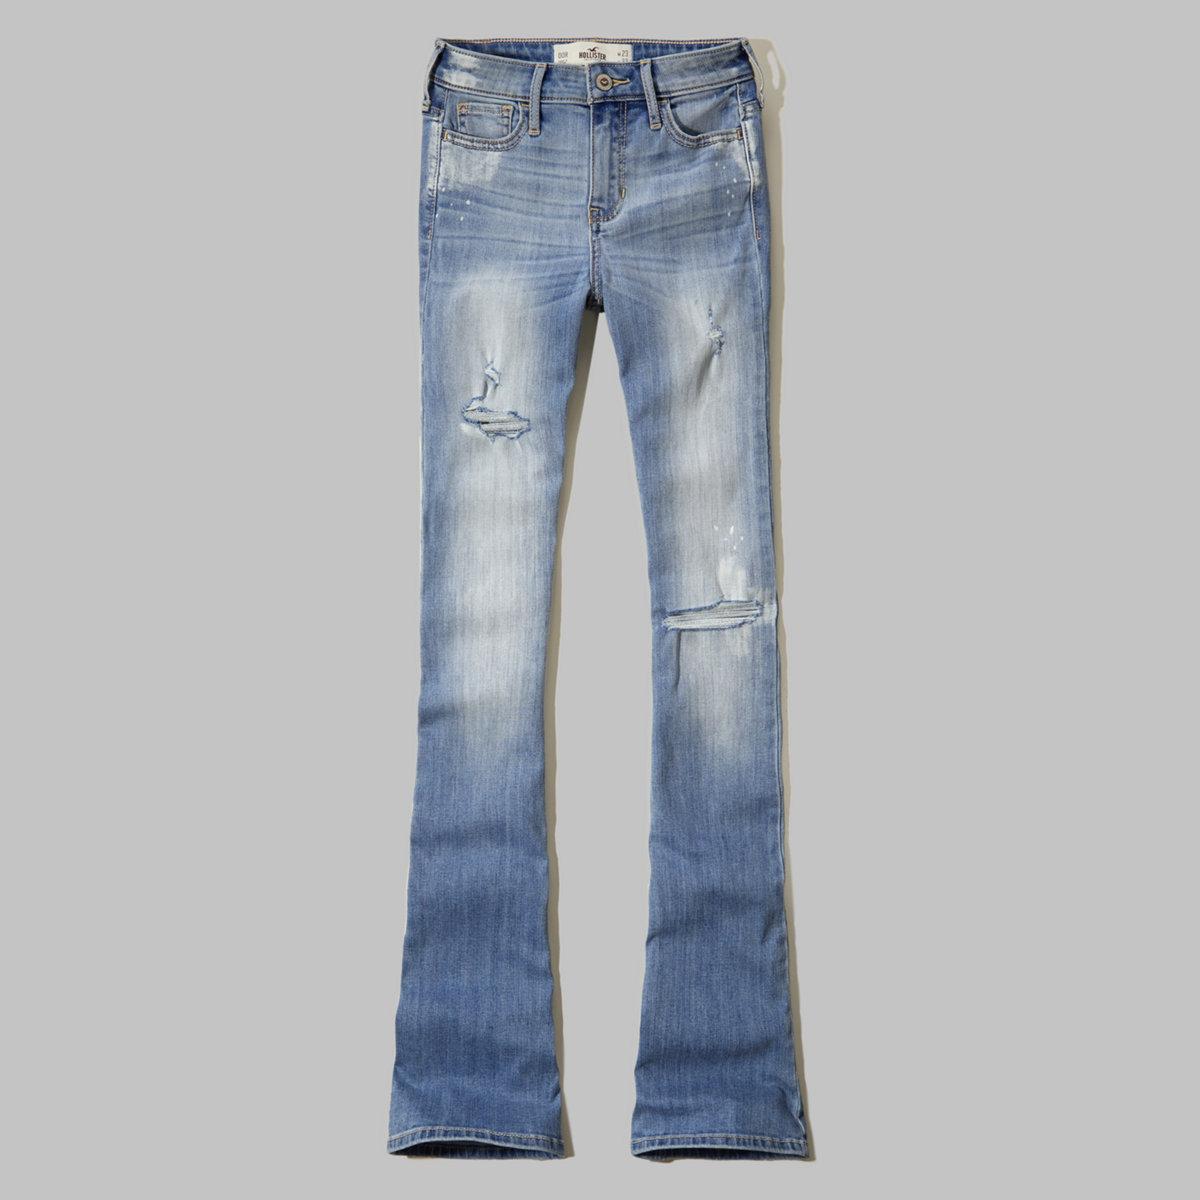 Hollister Matti High Rise Flare Jeans